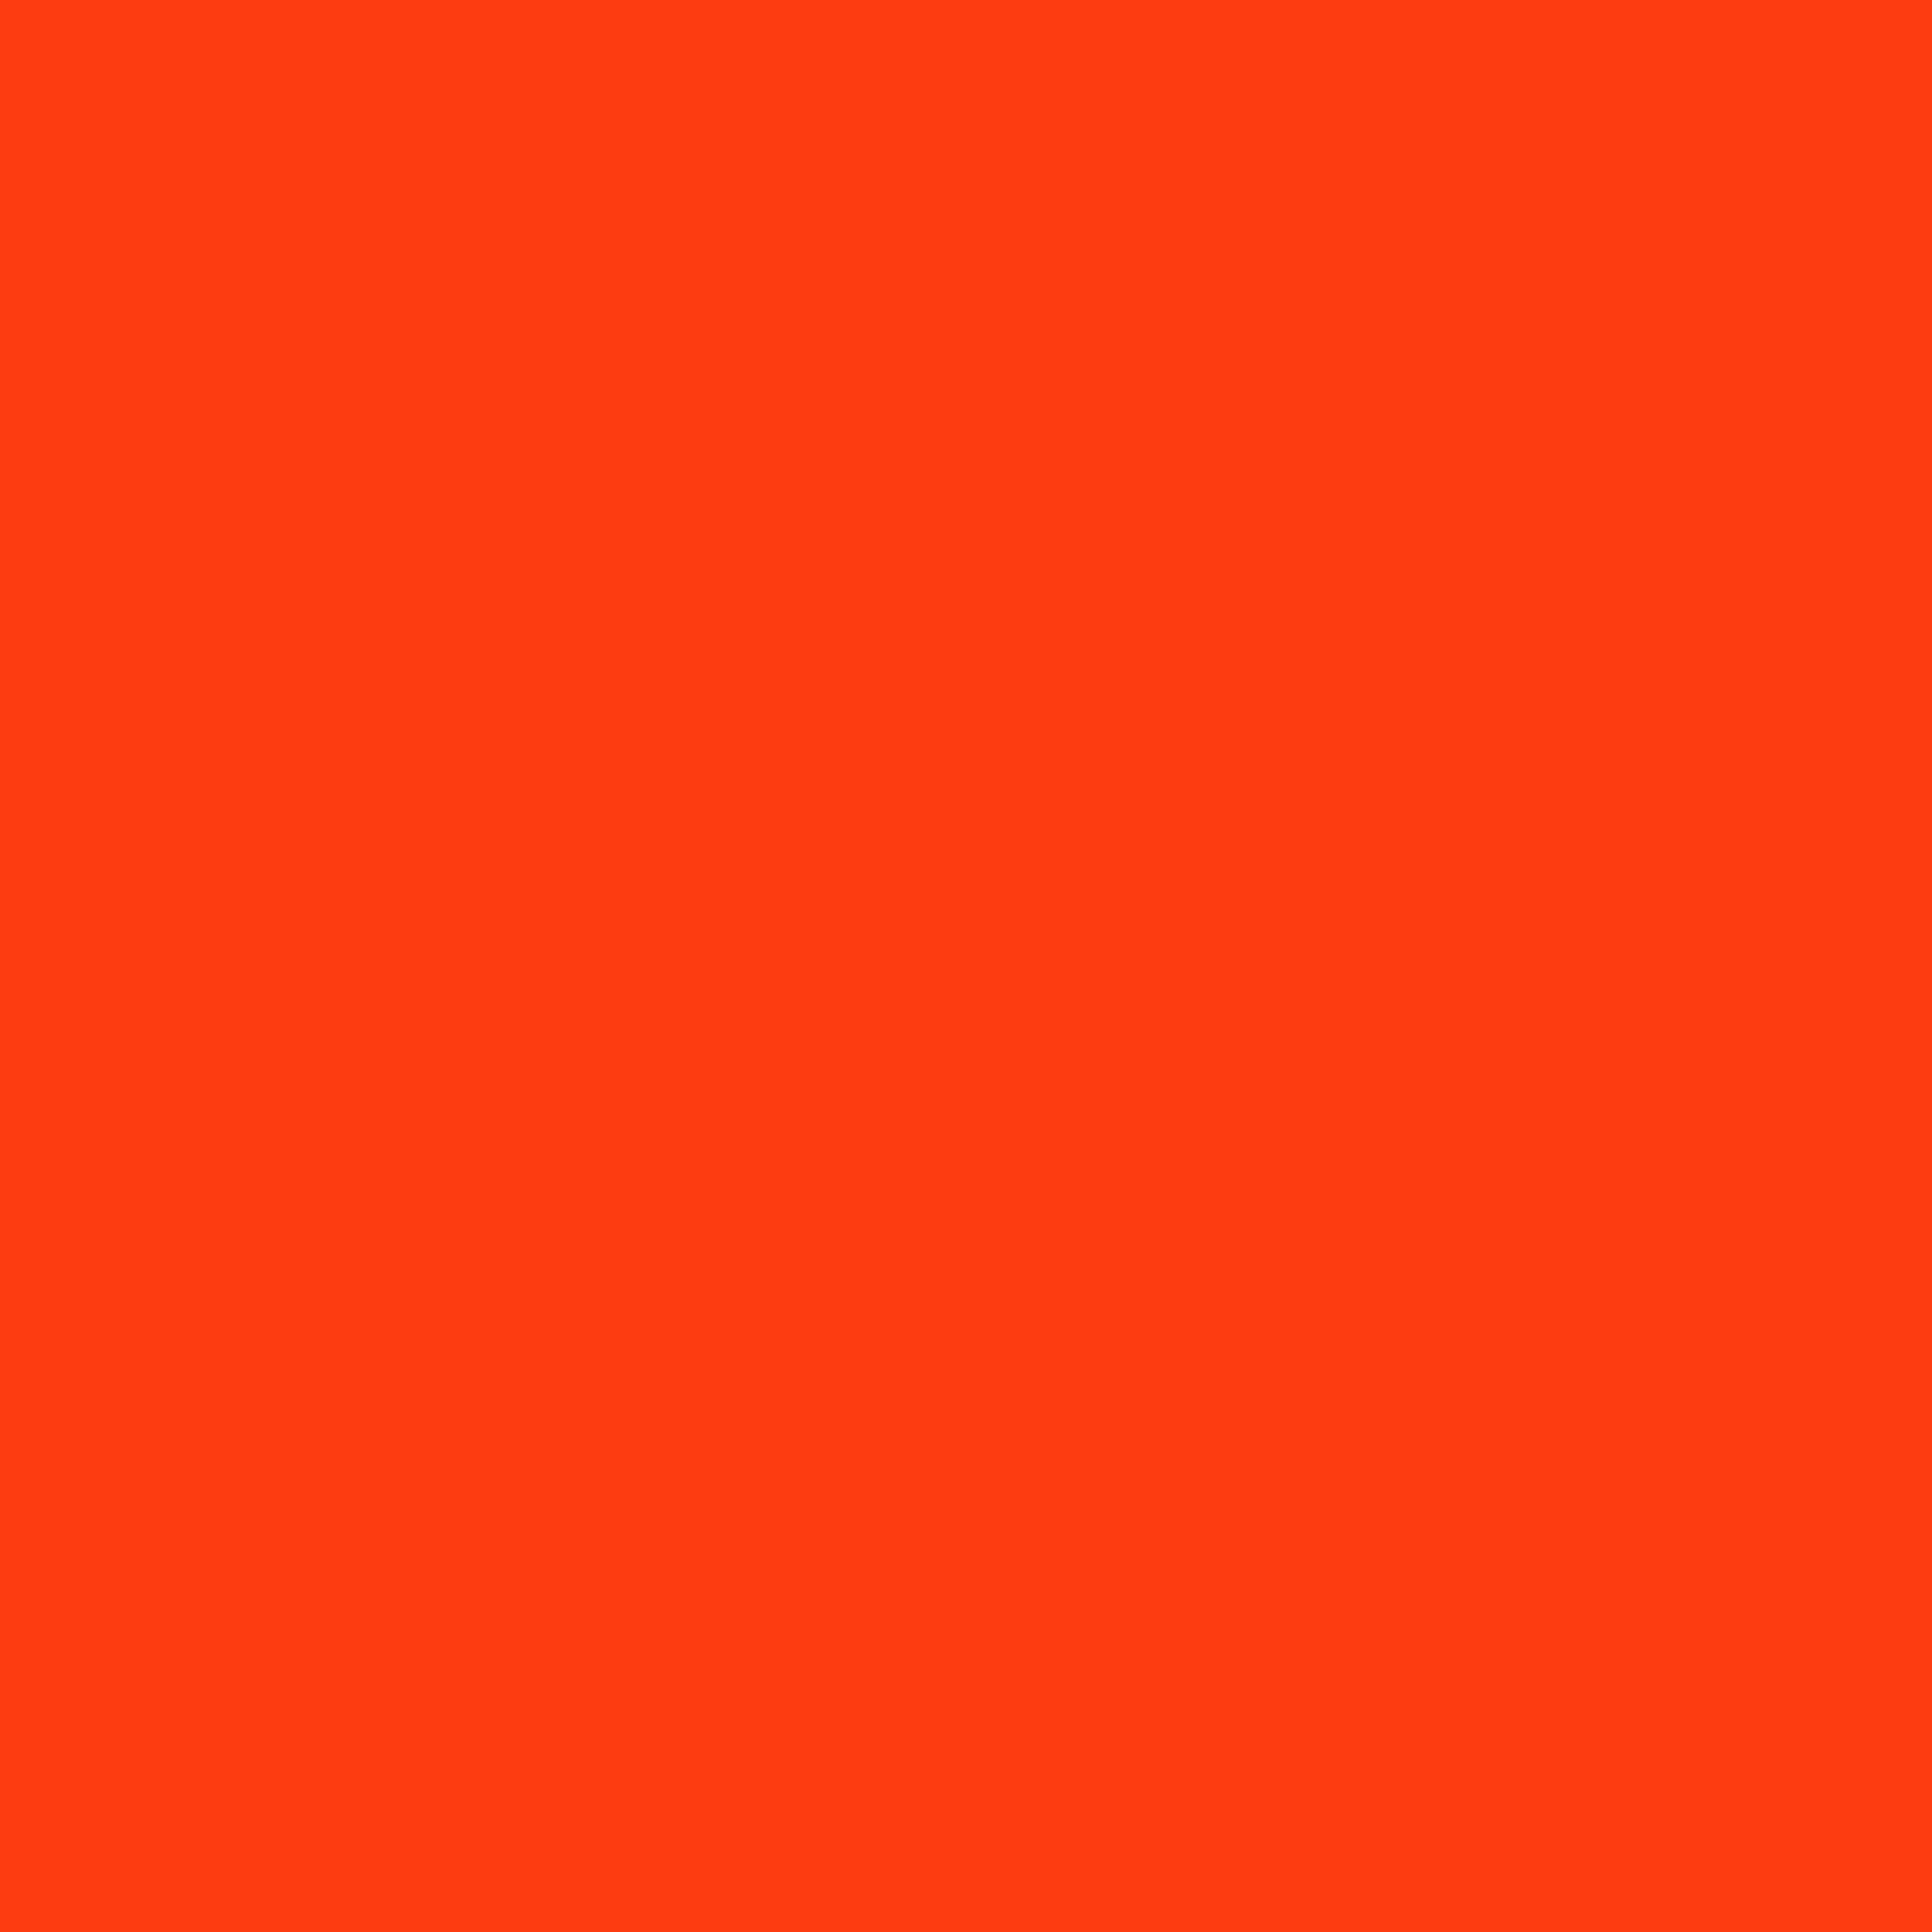 K10.1.8 Red Orange